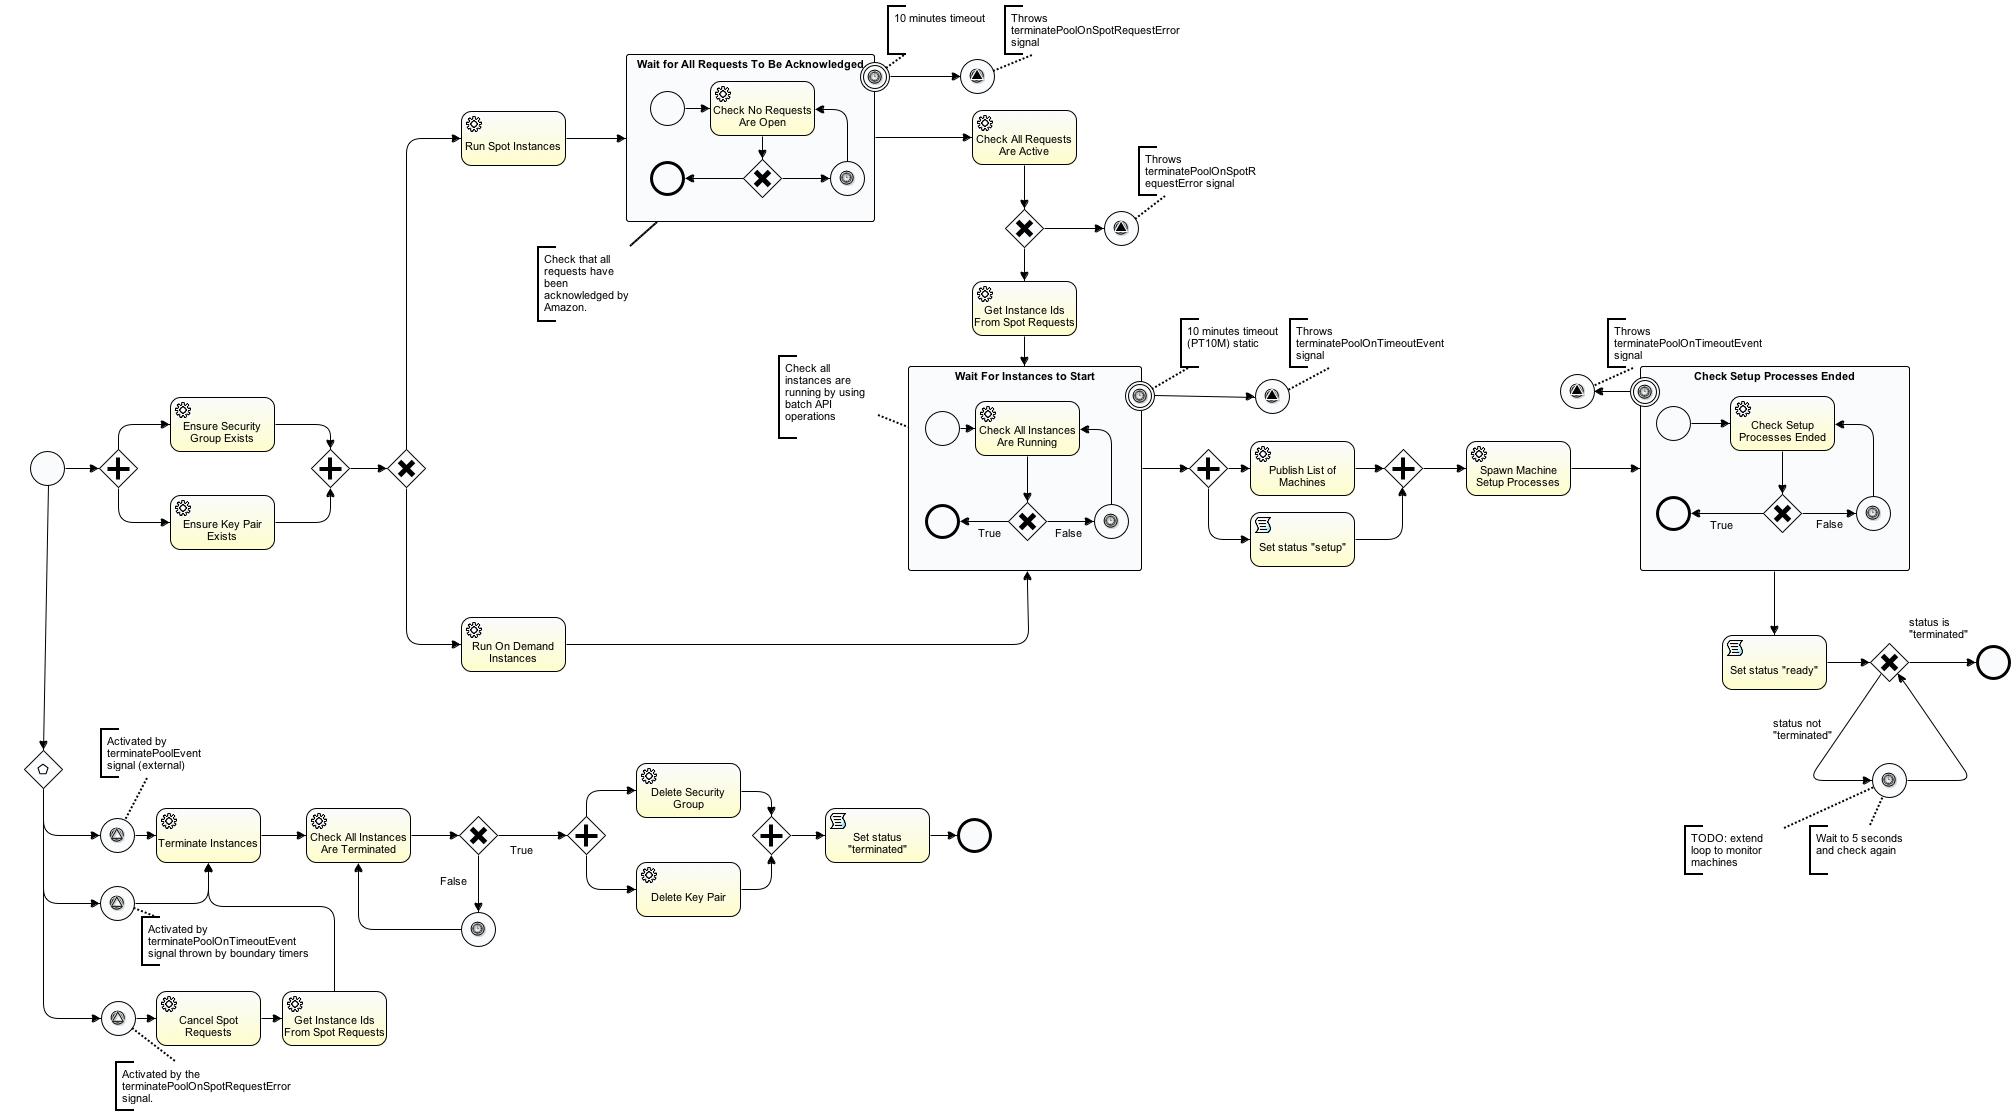 Sample pool management process